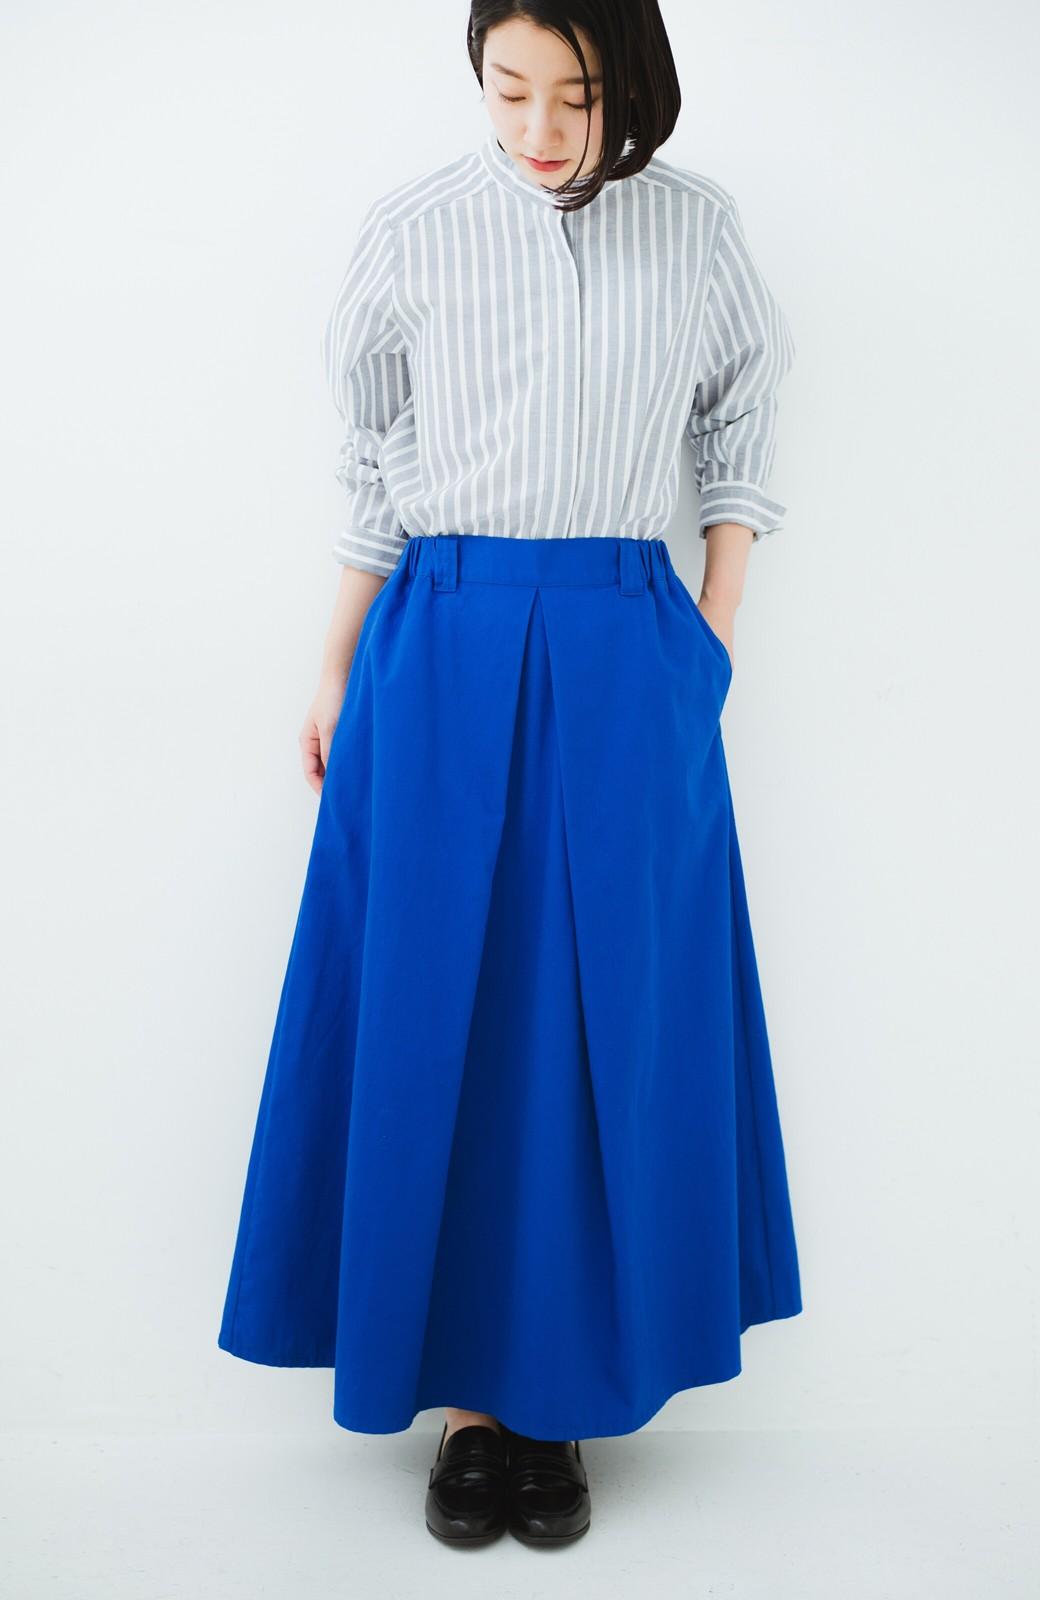 haco! 【今年も再販!】ロングシーズン楽しめる タックボリュームのチノロングスカート <ブルー>の商品写真18